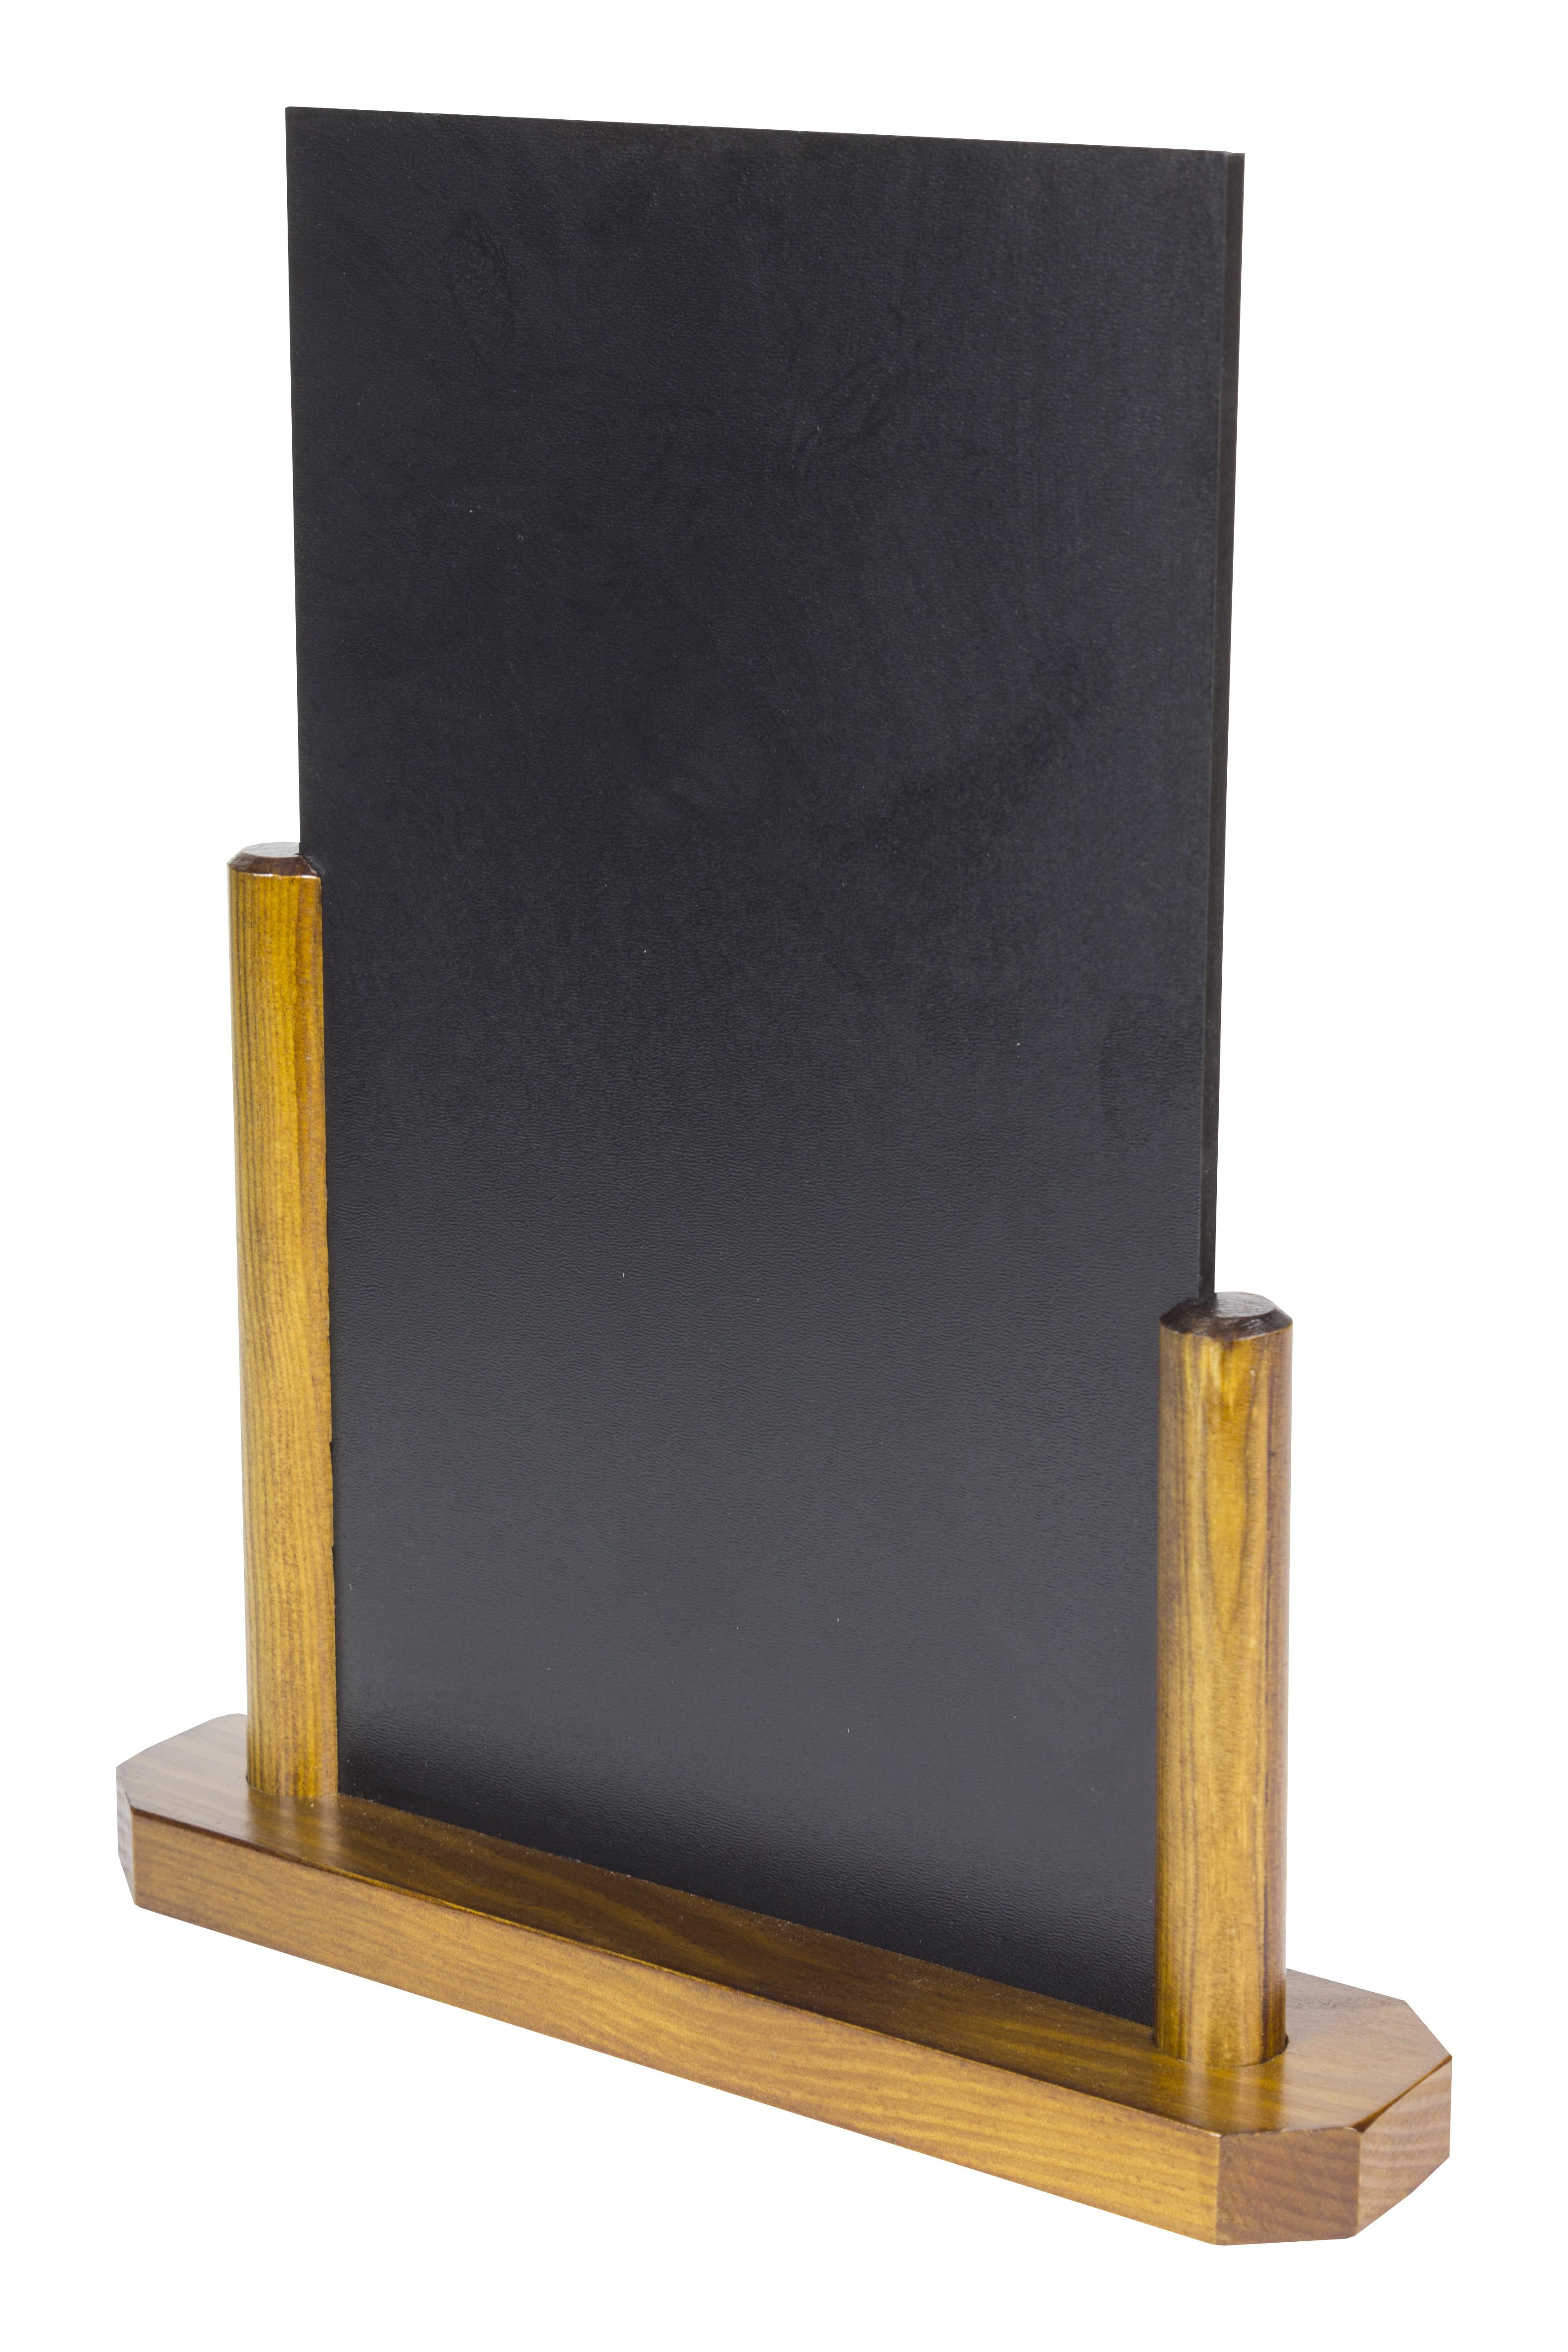 Pizarras de madera para sobremesa - DEPAPEL